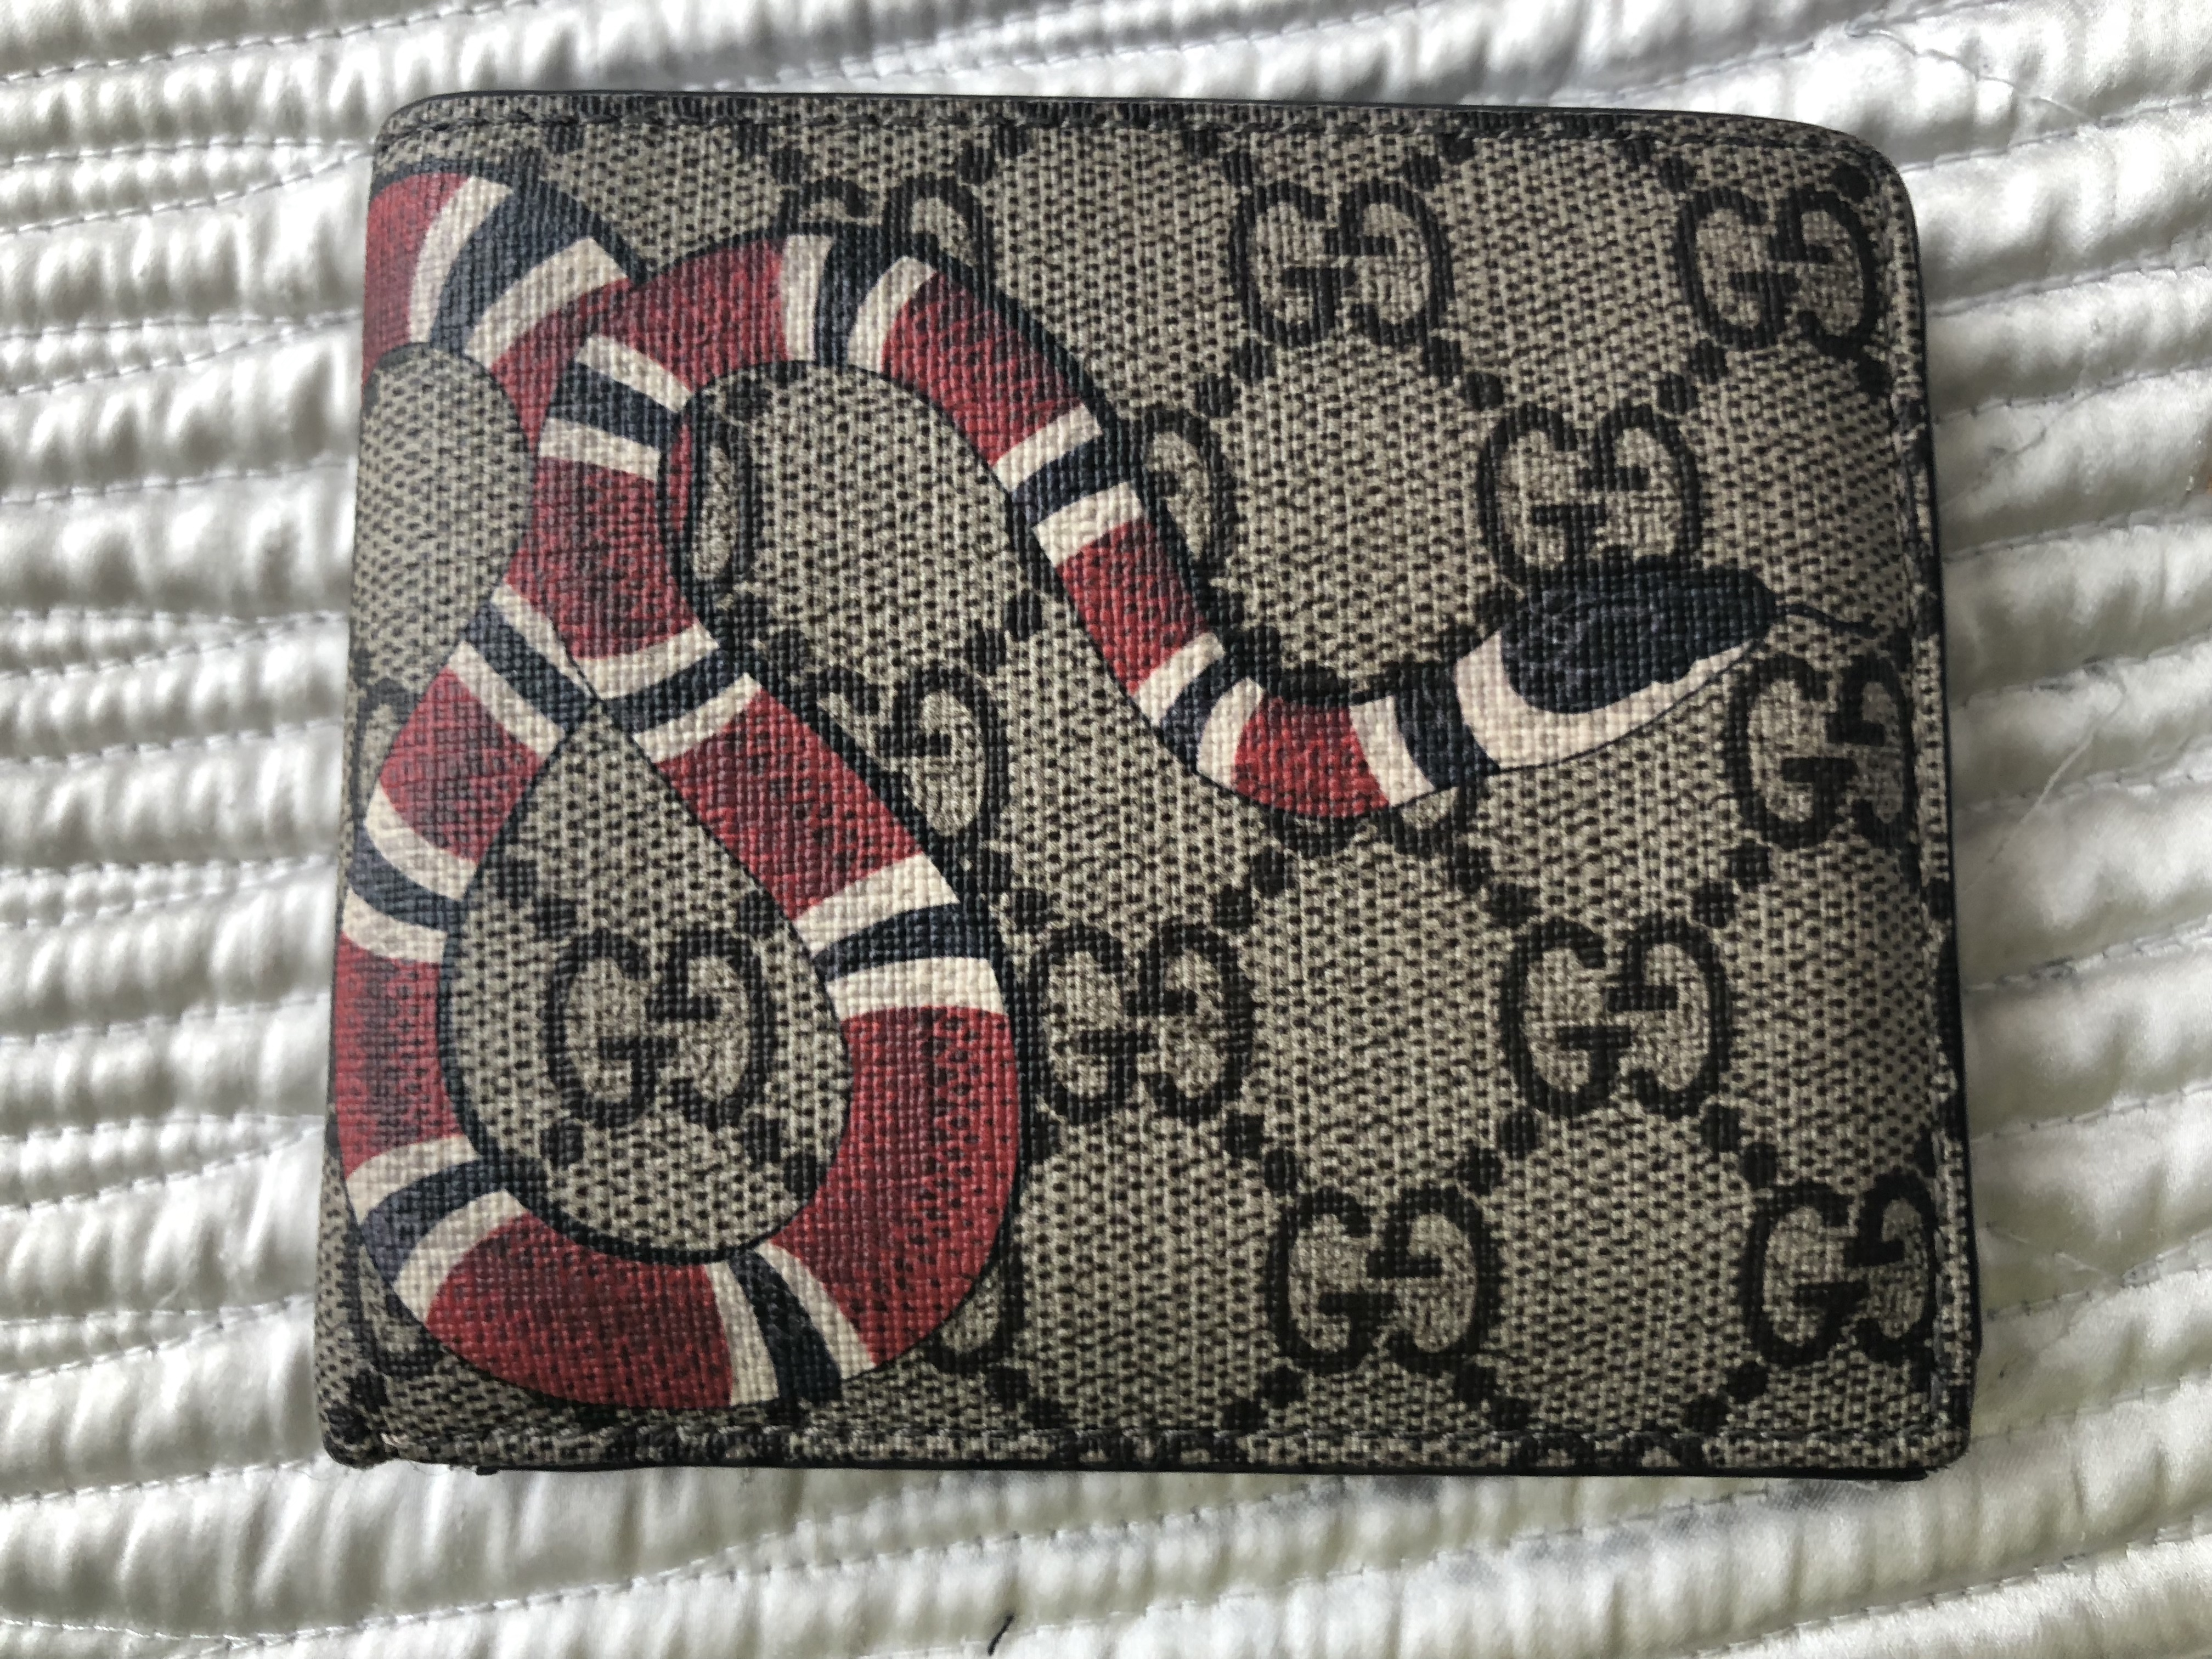 d6724ae3c709 Gucci Gucci Kingsnake Snake Print Gg Supreme Wallet | Grailed